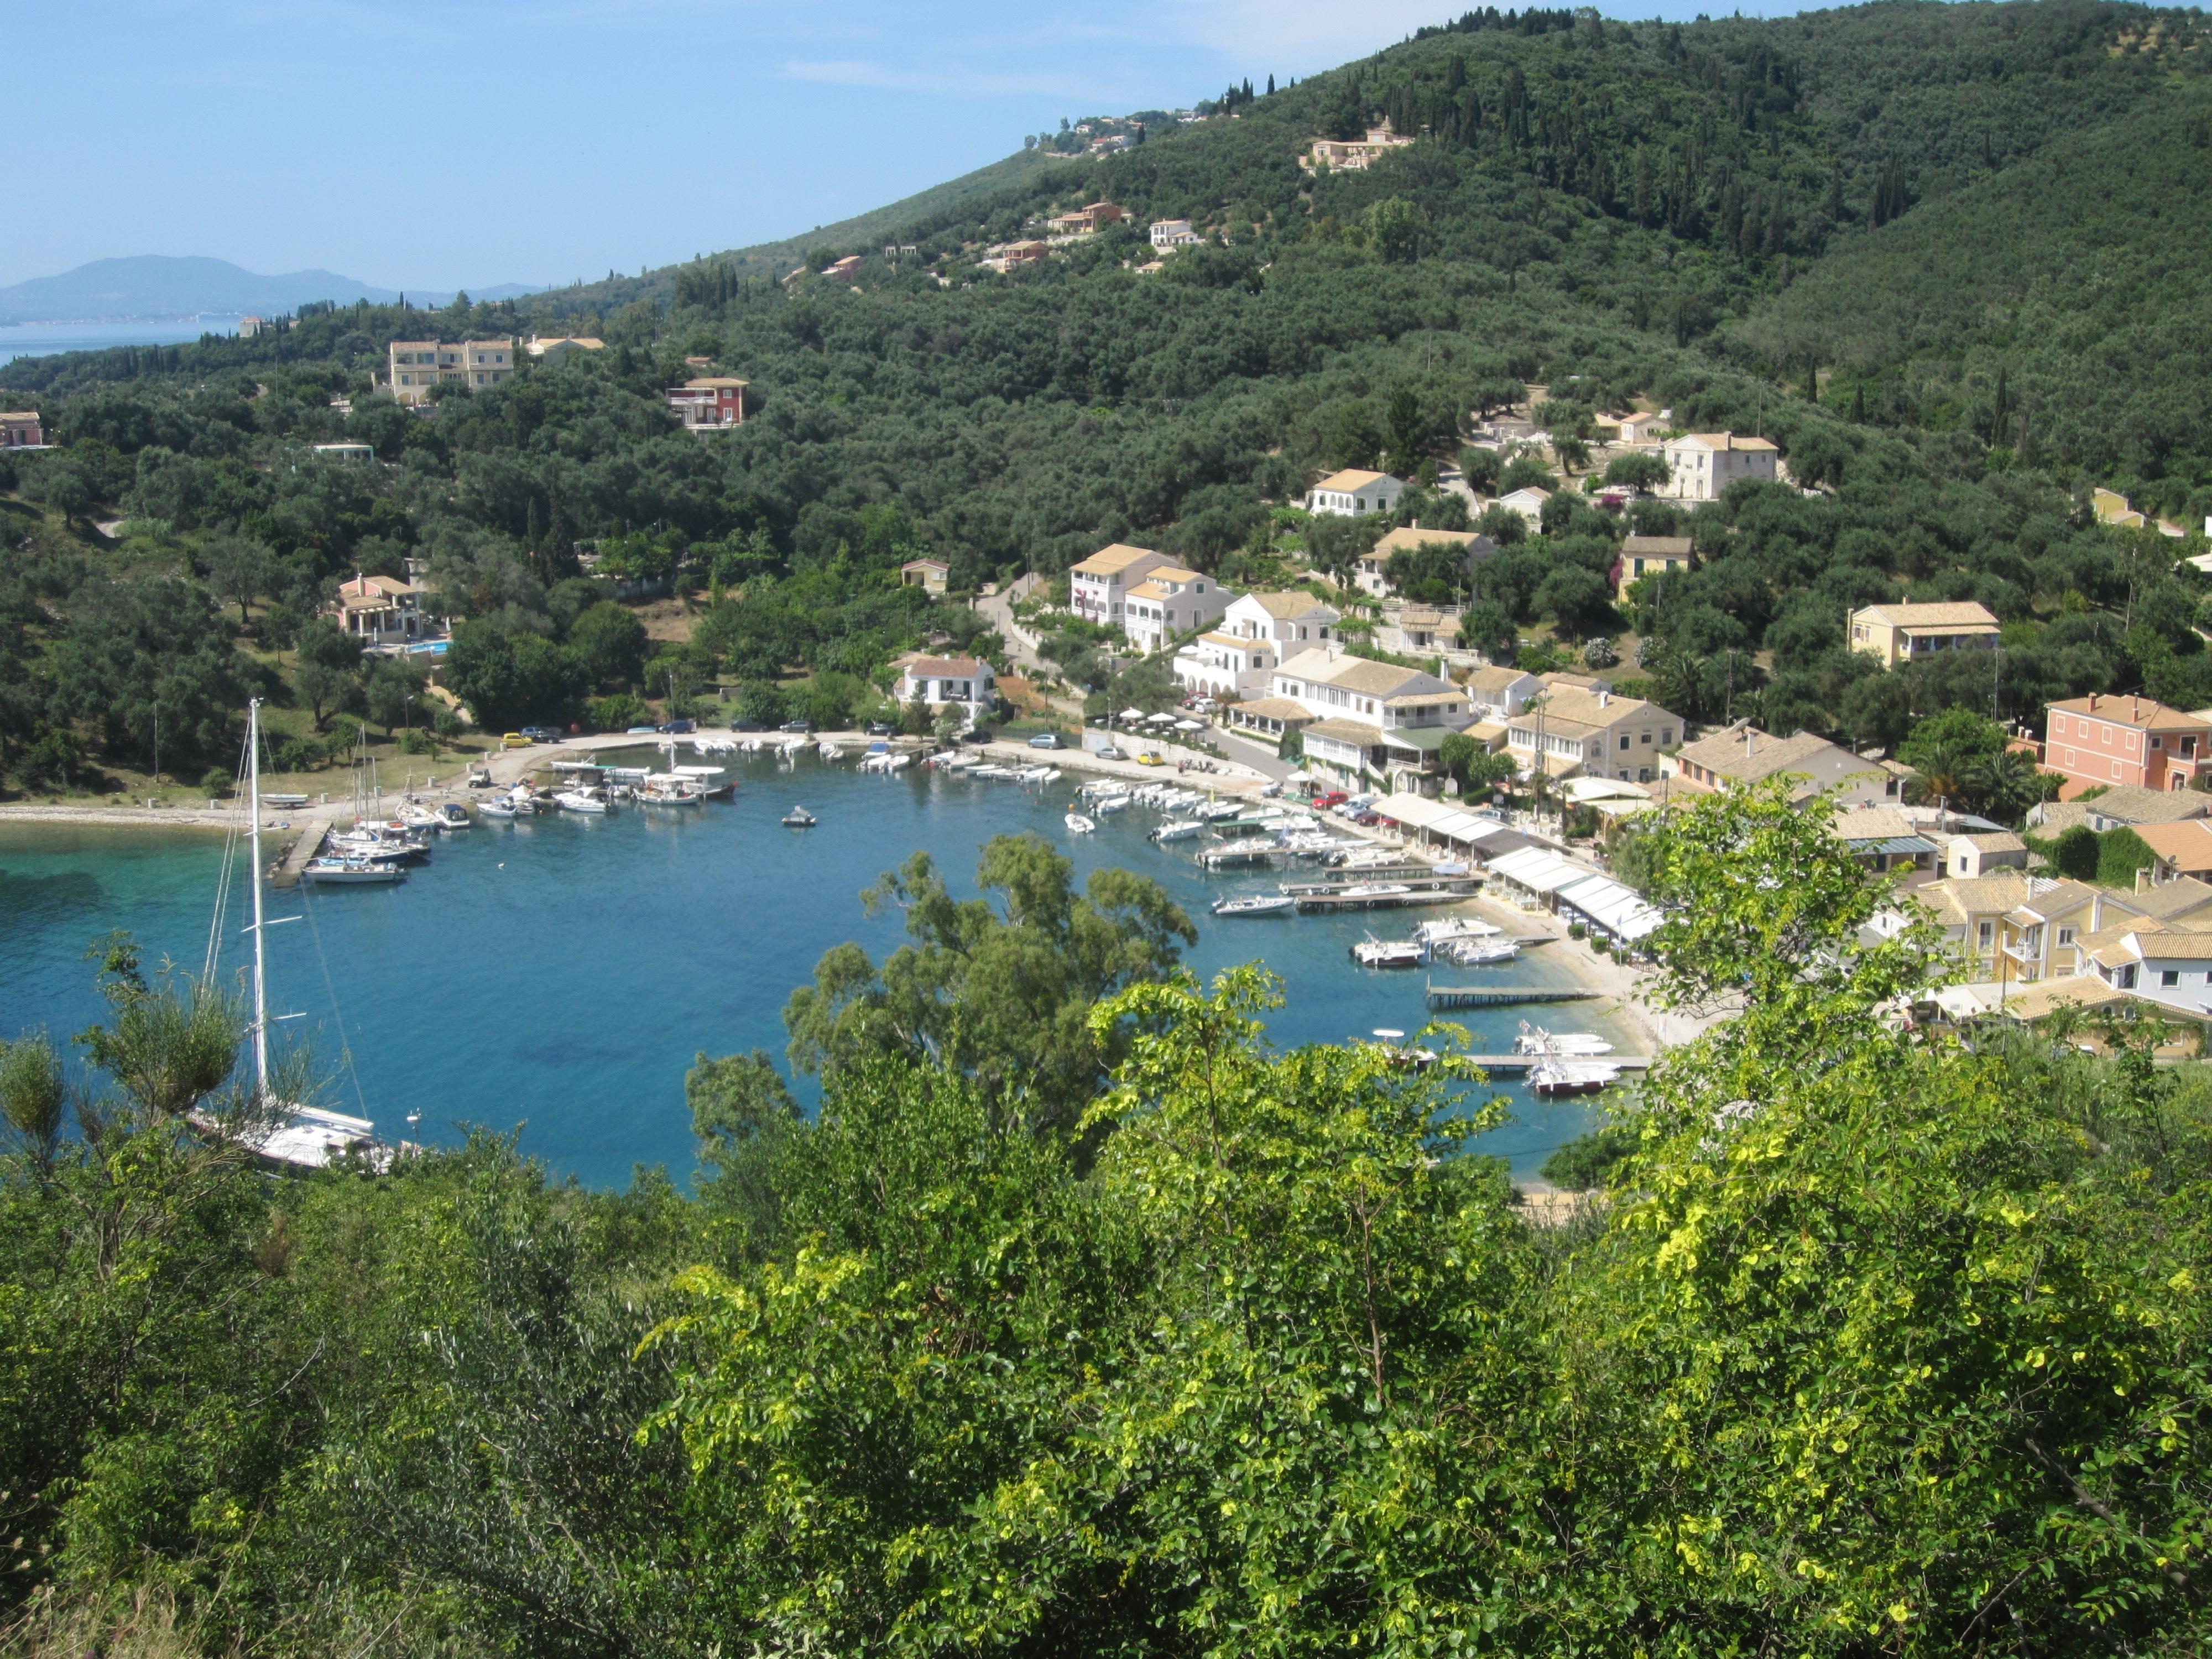 Noleggio Barche Agios Stefanos – Isola di Corfù - Navalia | Noleggia un Sogno